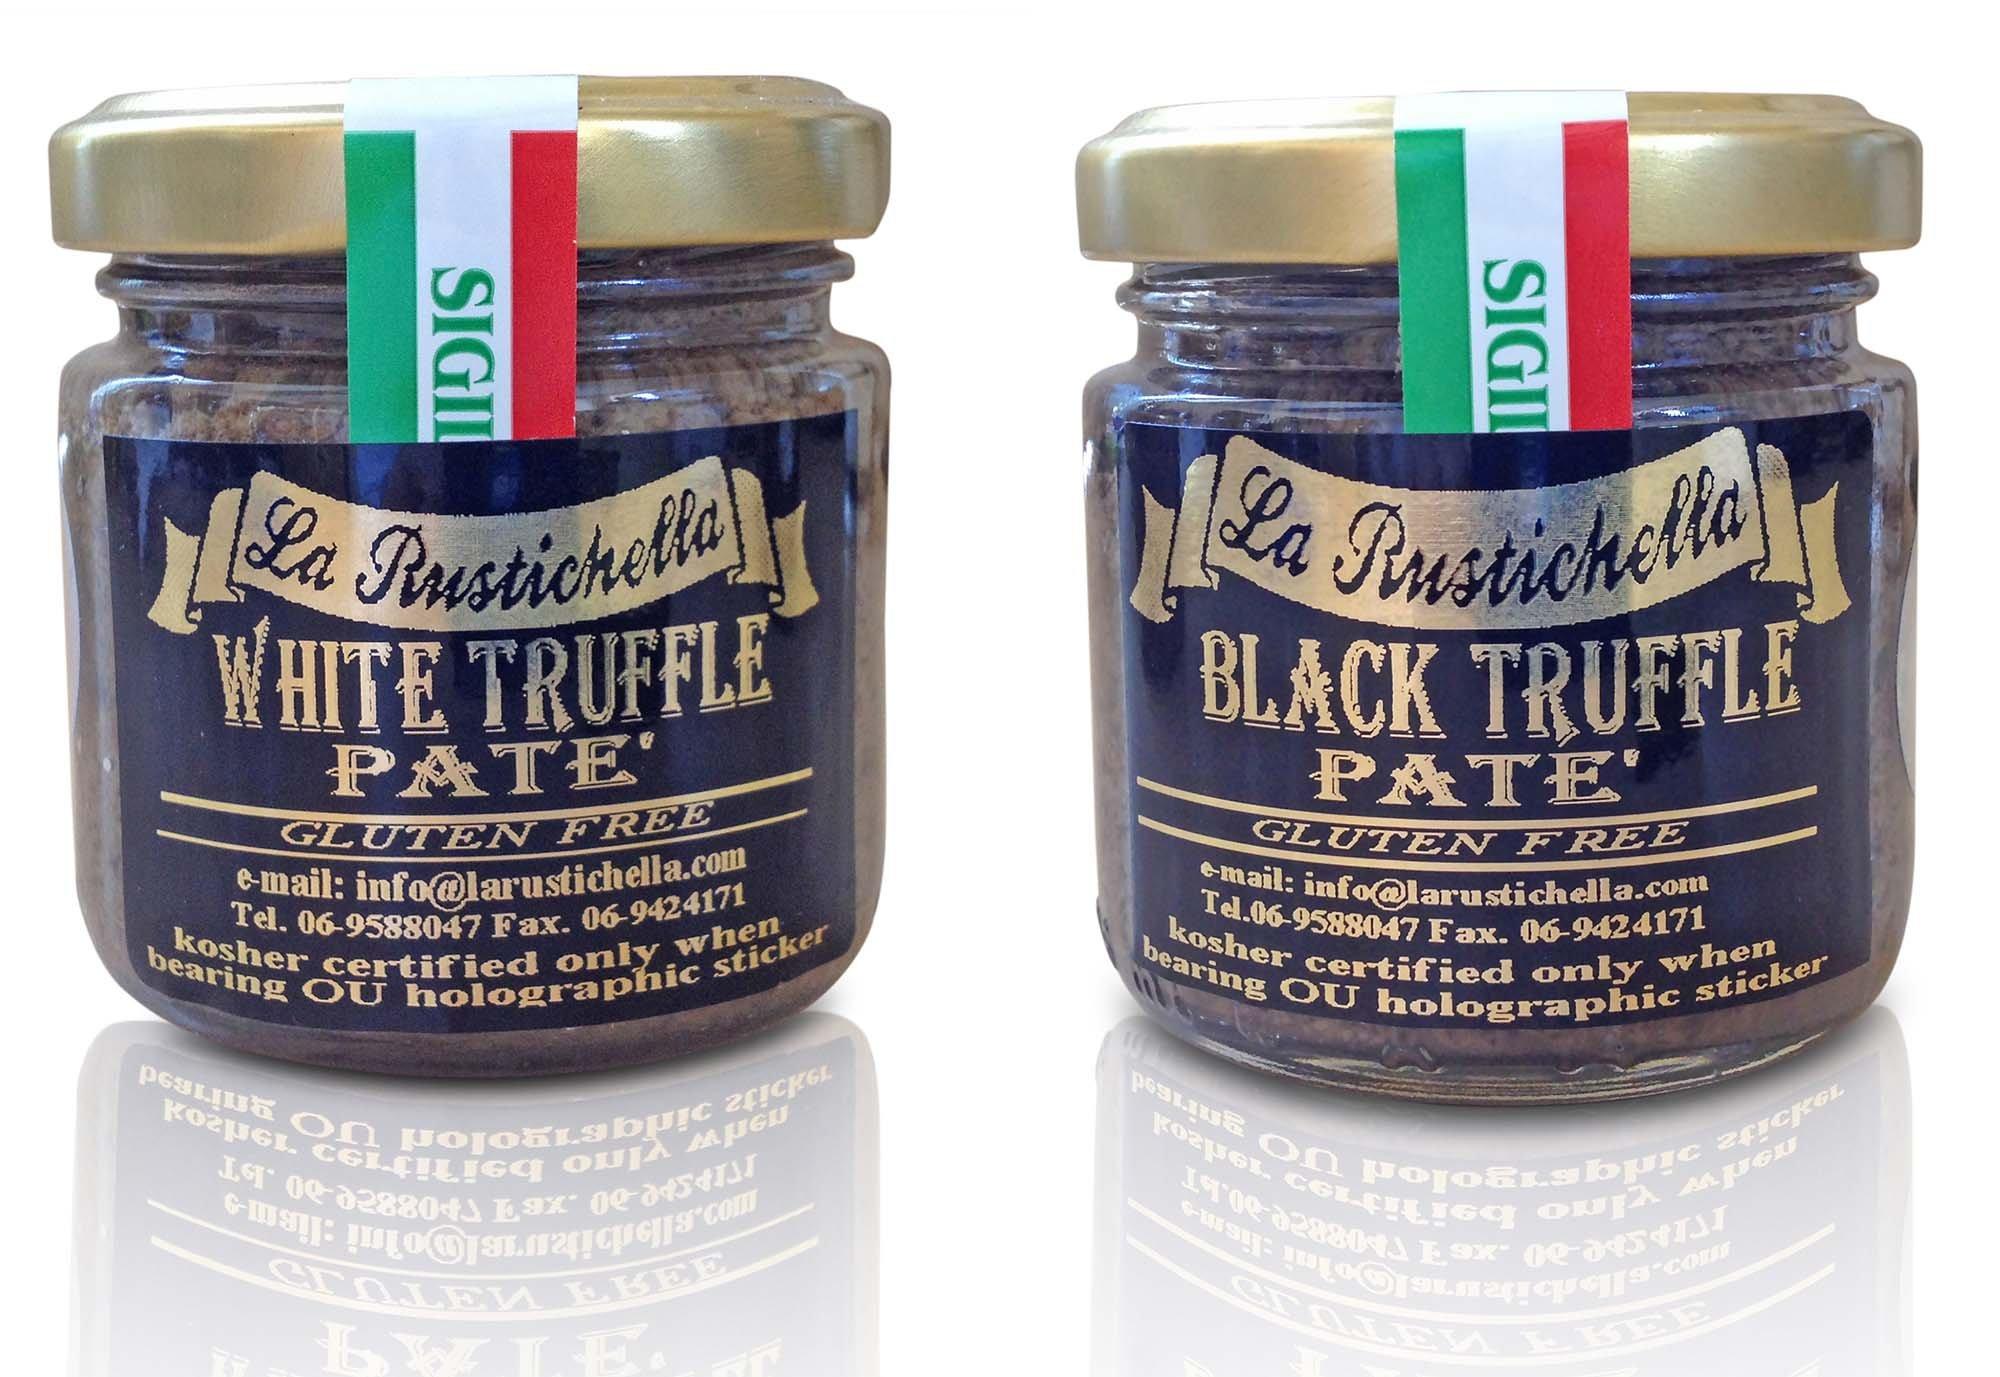 La Rustichella Truffles USA - Gourmet Truffle Pate - OU Kosher - Truffle Pate Variety (Net Wt. 3.2 oz each) by  La Rustichella